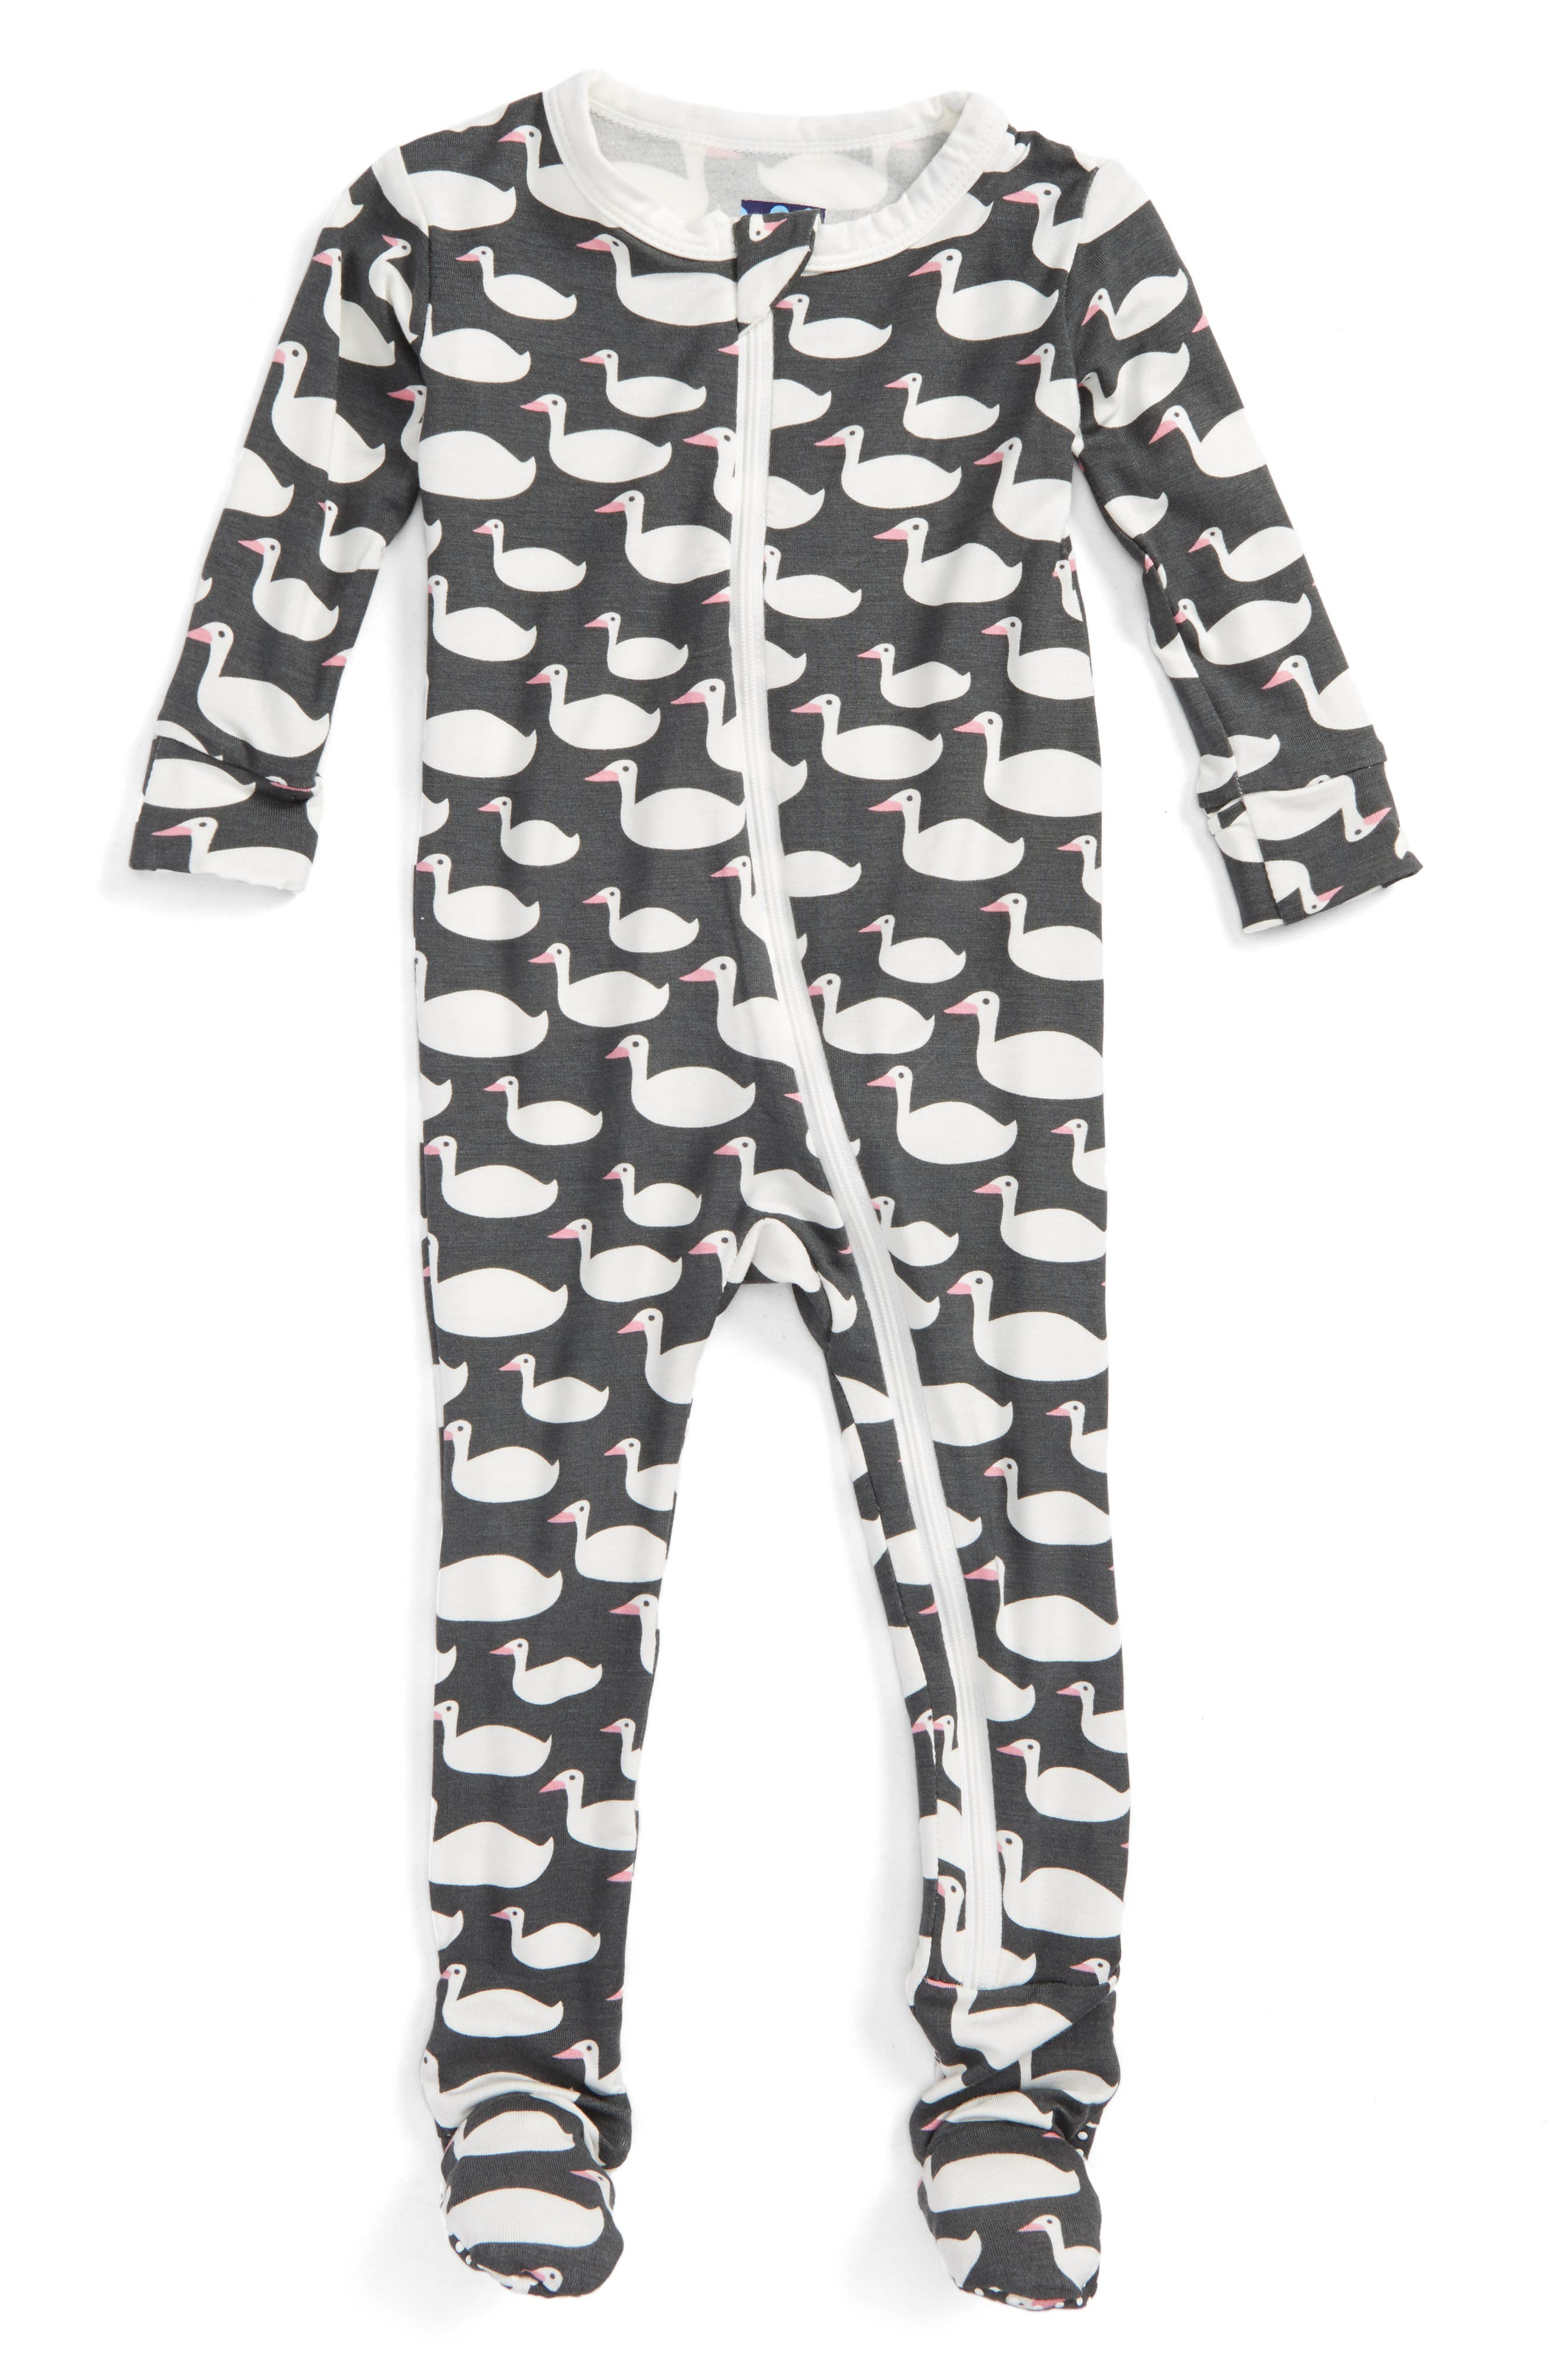 KICKEE PANTS Fitted One-Piece Footie Pajamas